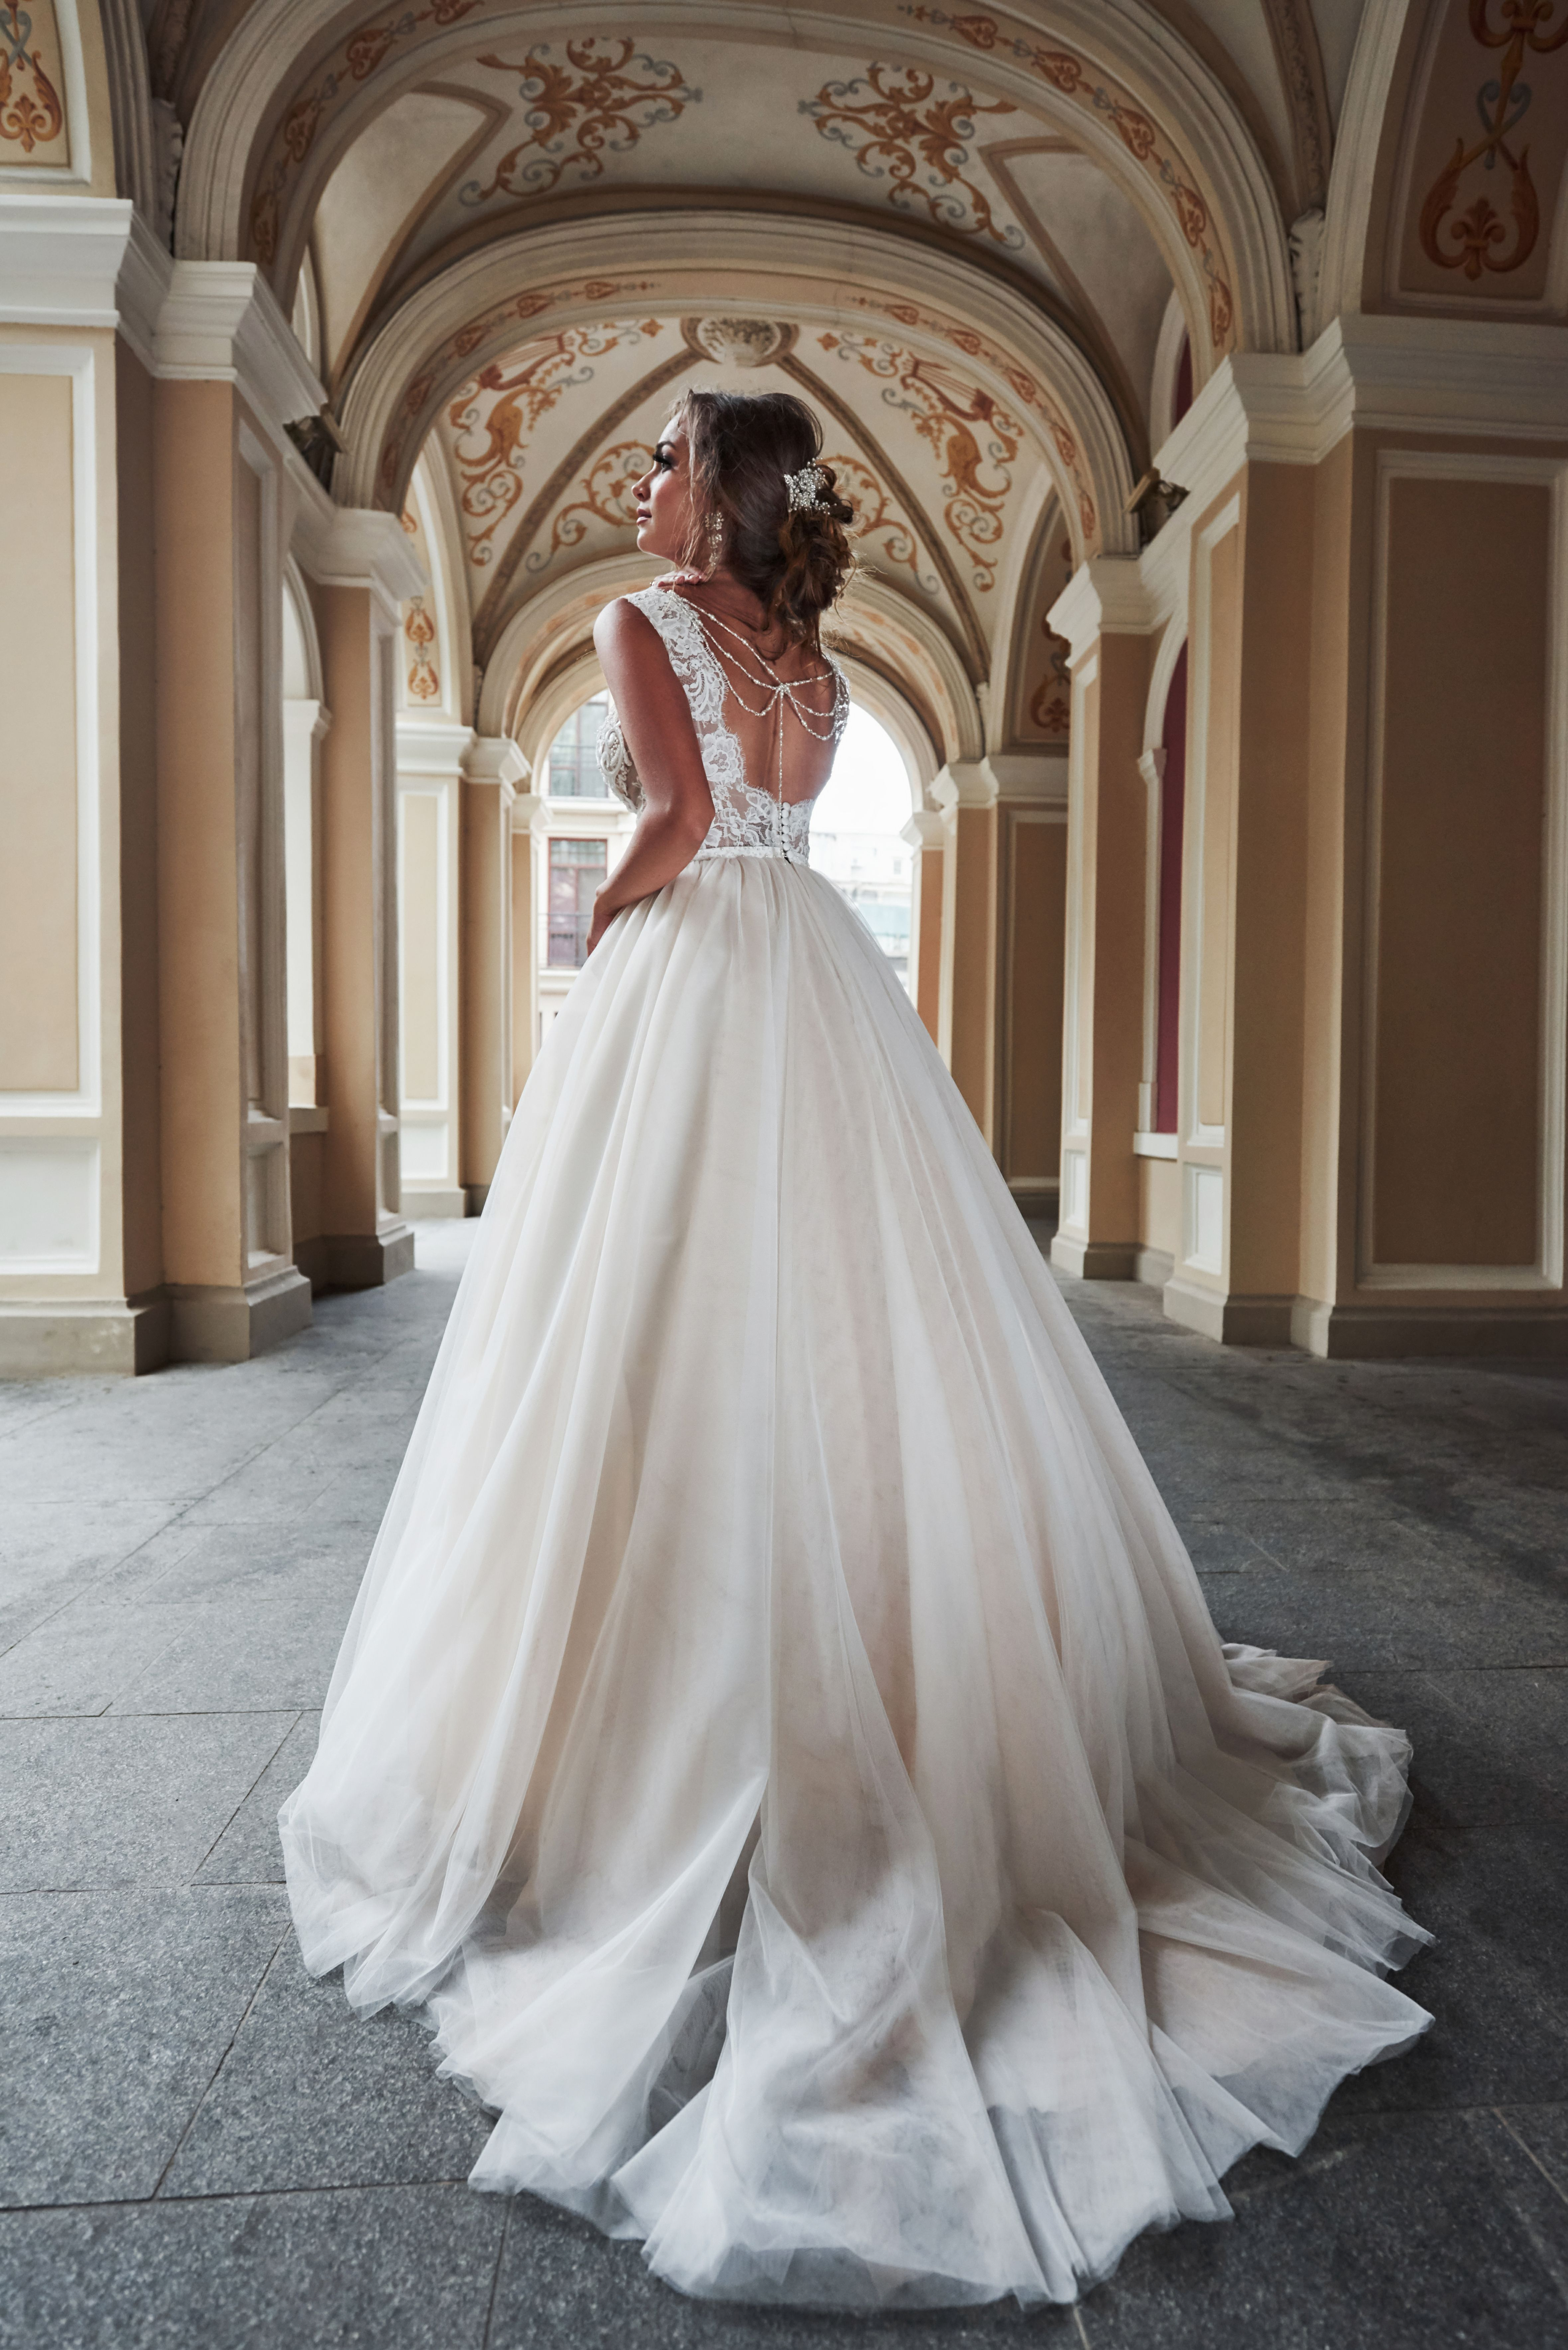 Suknia Slubna Z Odkrytymi Plecami I Bizuteria Wesele Glamour Wedding Dresses Wedding Poses Dresses